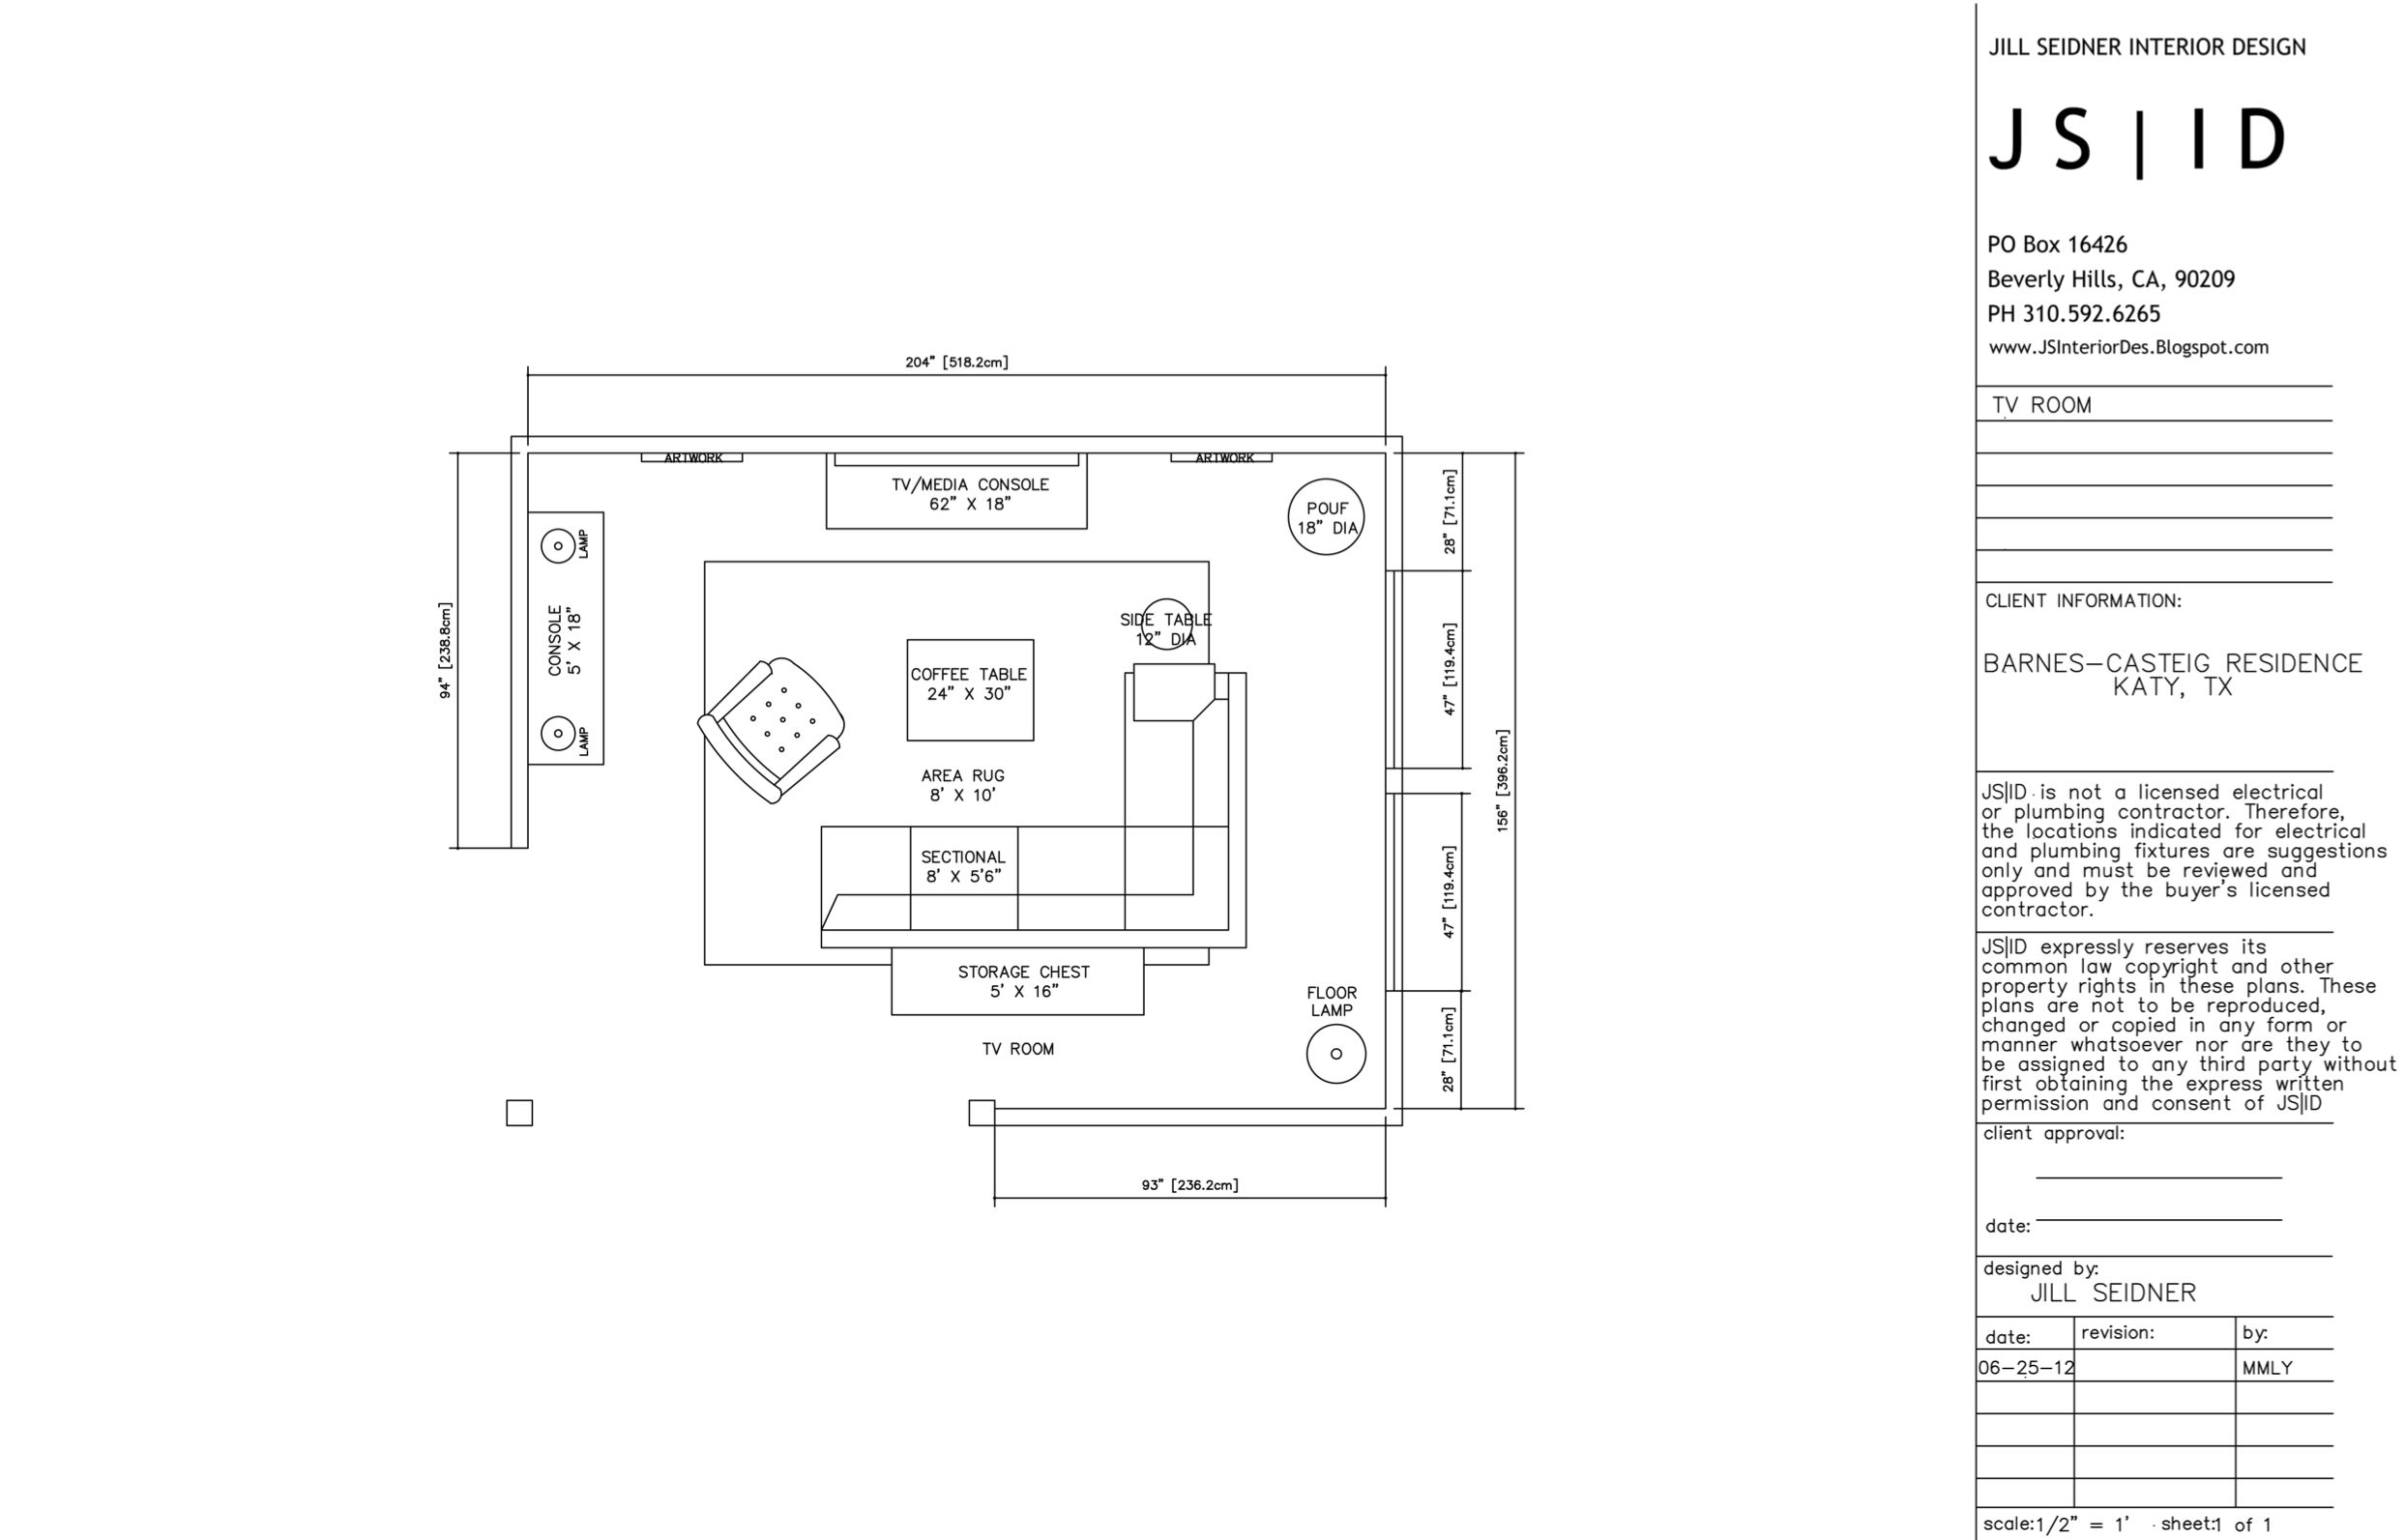 Katy TX Online Design Project TV Room Furniture Floor Plan Layout Option 2